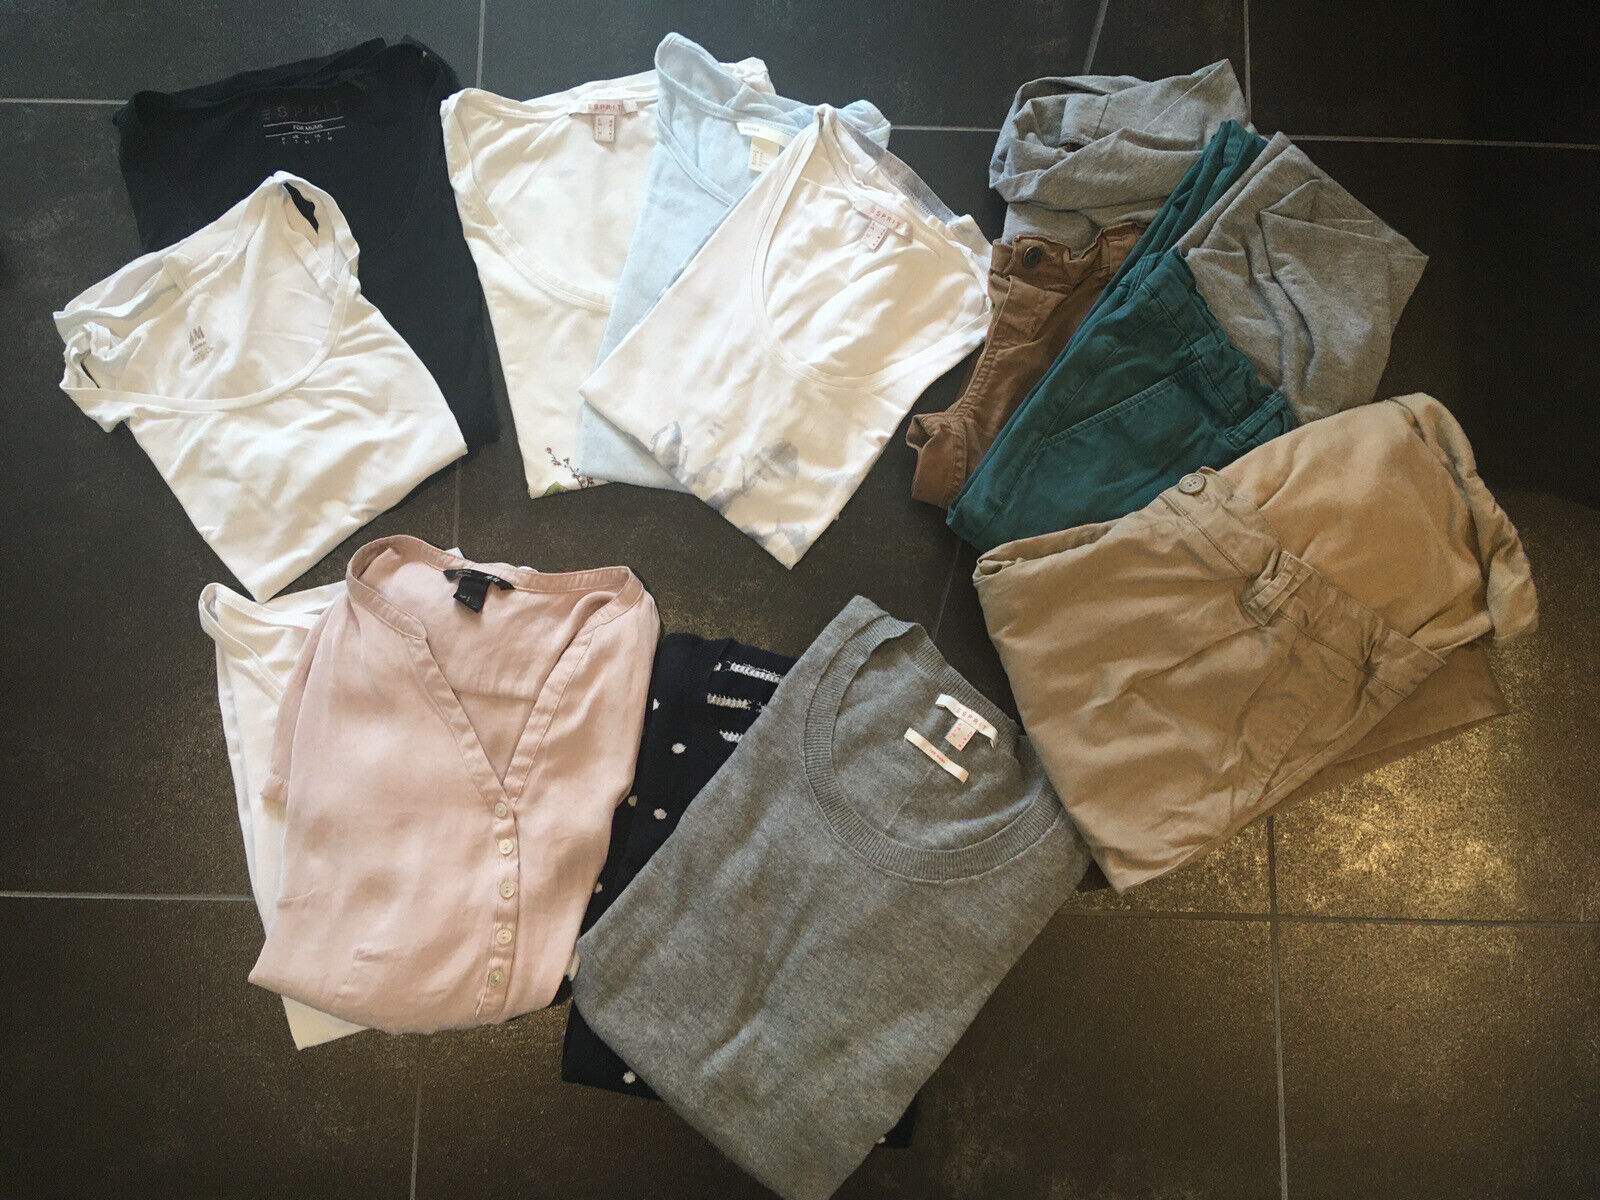 Umstandskleidung Paket Hosen, Oberteile, Esprit, H&M, etc, Größe S/M